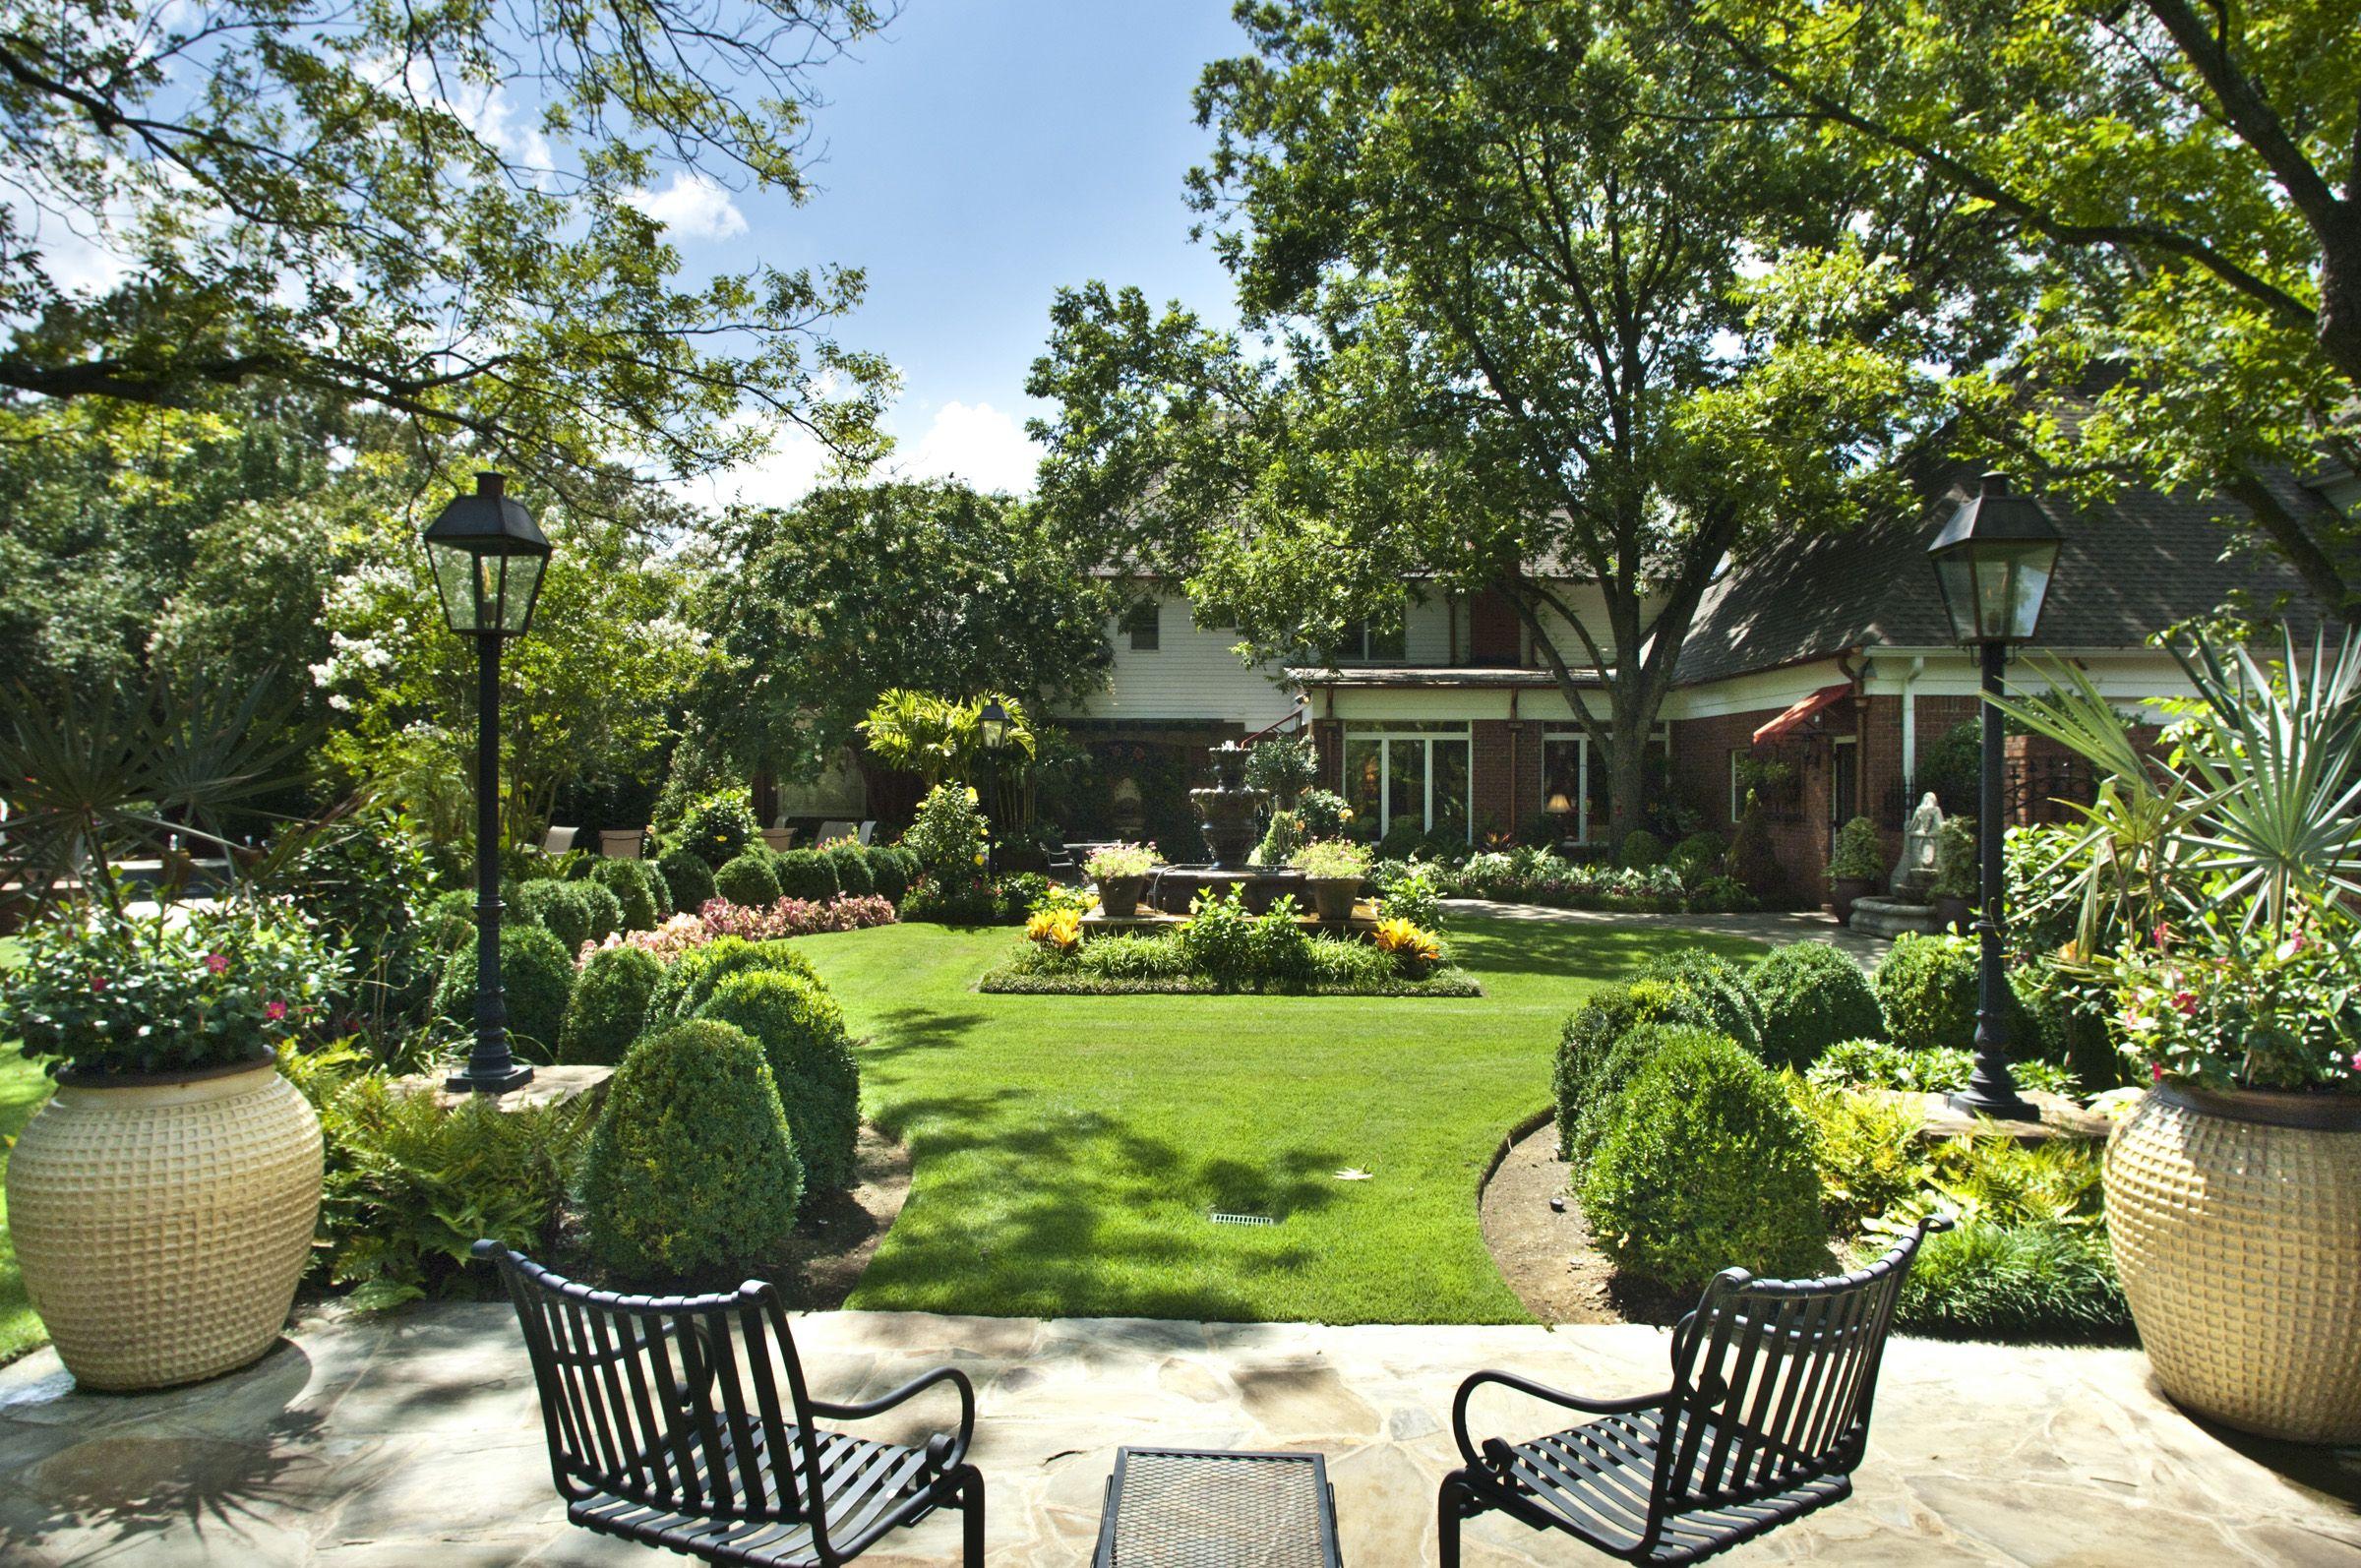 Backyard Landscape By Gurley S Azalea Garden Inc Memphis Tn Ww Gurleysmemphis Com Backyard Landscaping Azaleas Garden Backyard